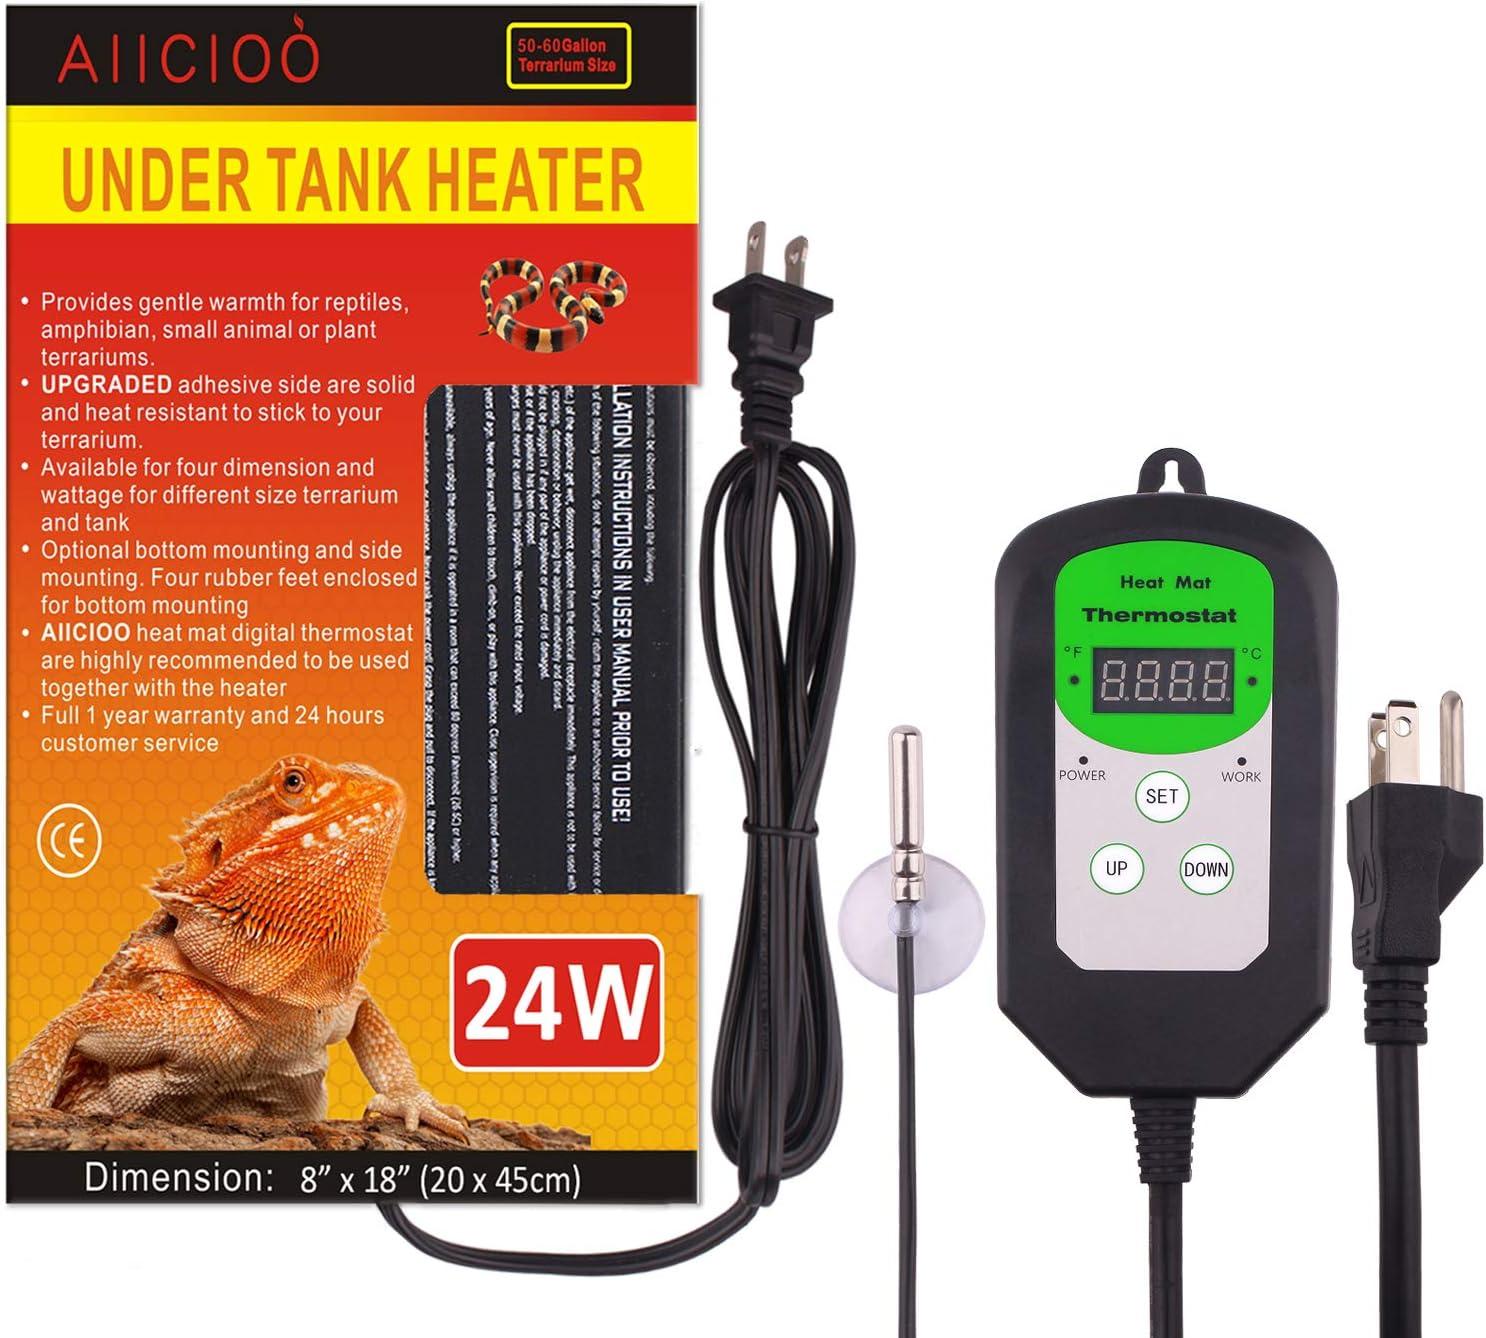 Aiicioo Large Reptile Heating pad with Digital Thermostat - 24 Watt Under Tank Heater with Temperature Control for Reptiles Terrarium